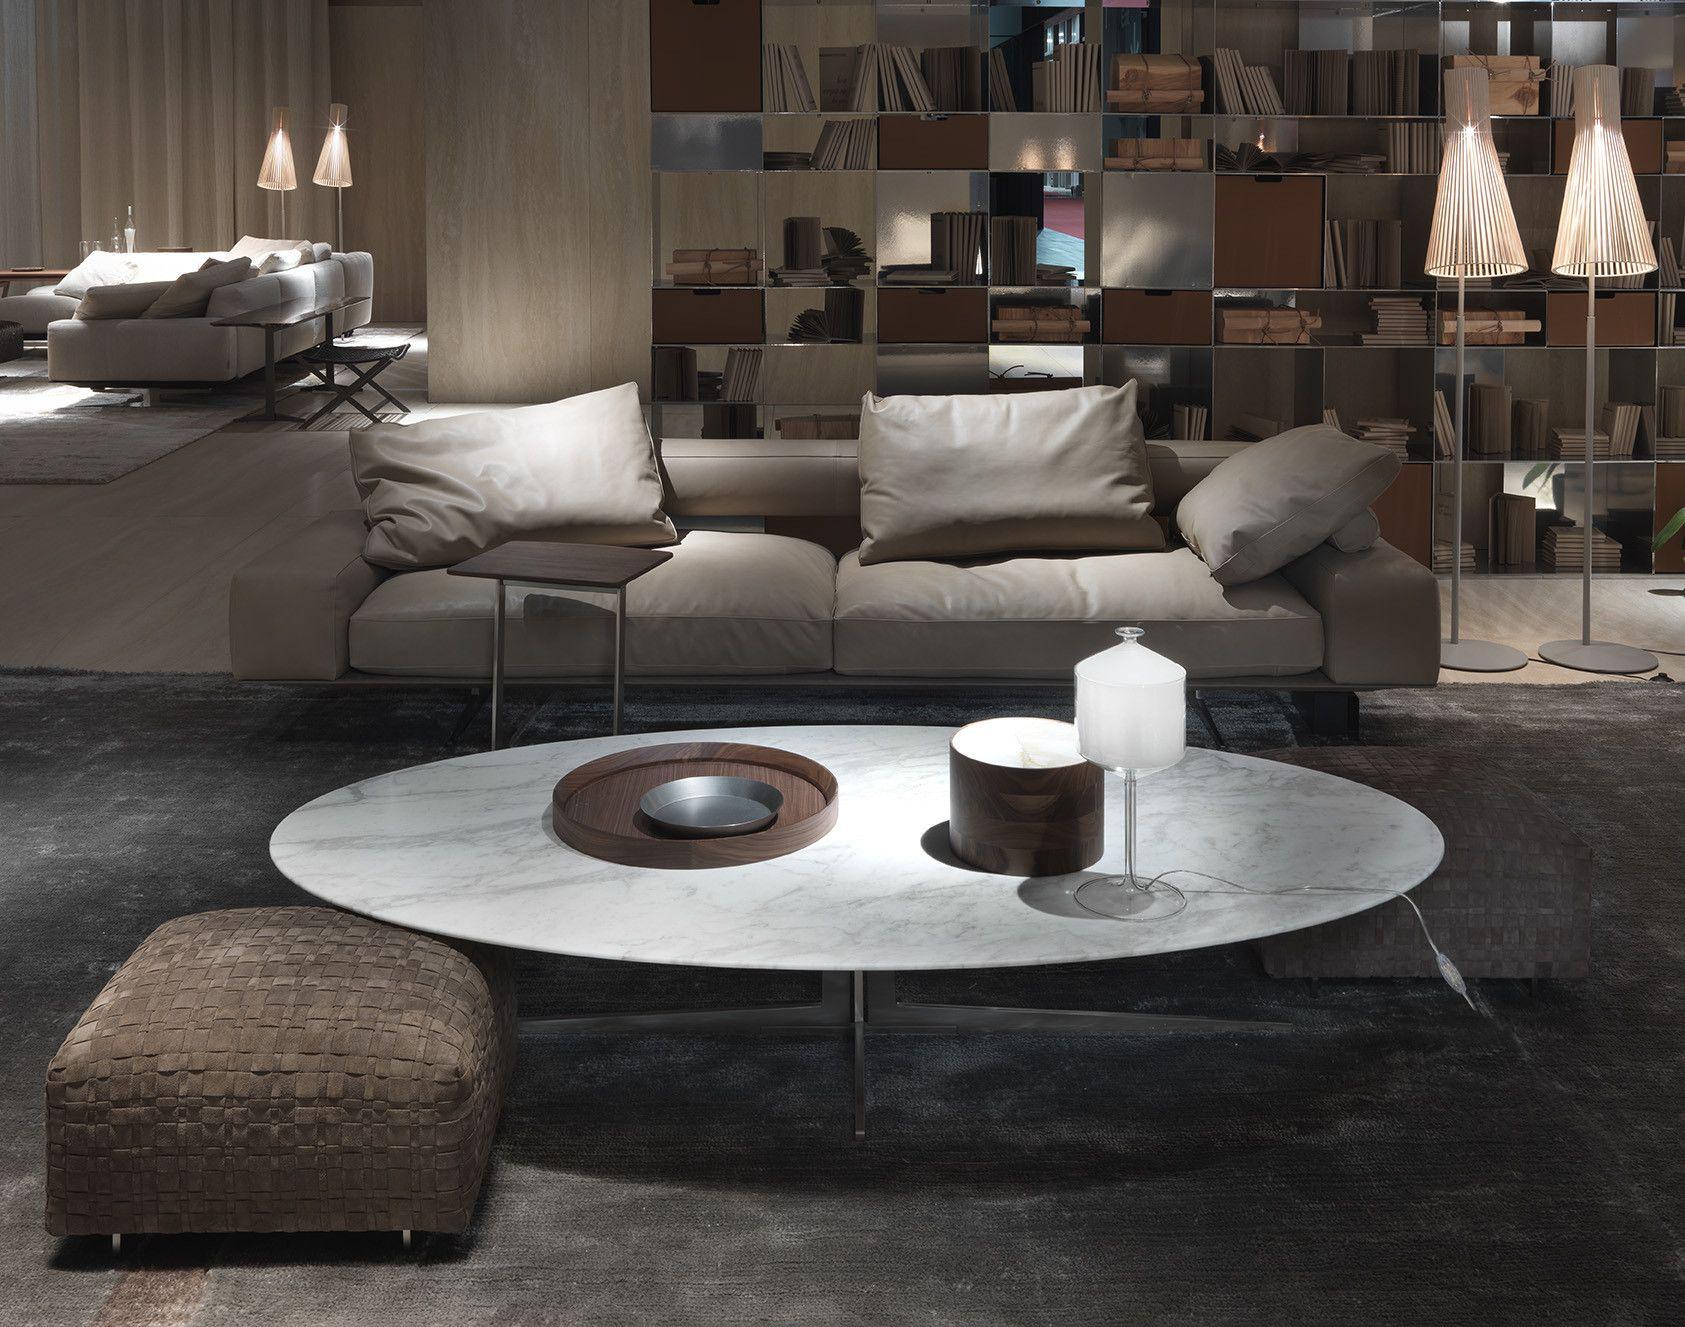 flexform lifesteel fly flexform pinterest sal n. Black Bedroom Furniture Sets. Home Design Ideas